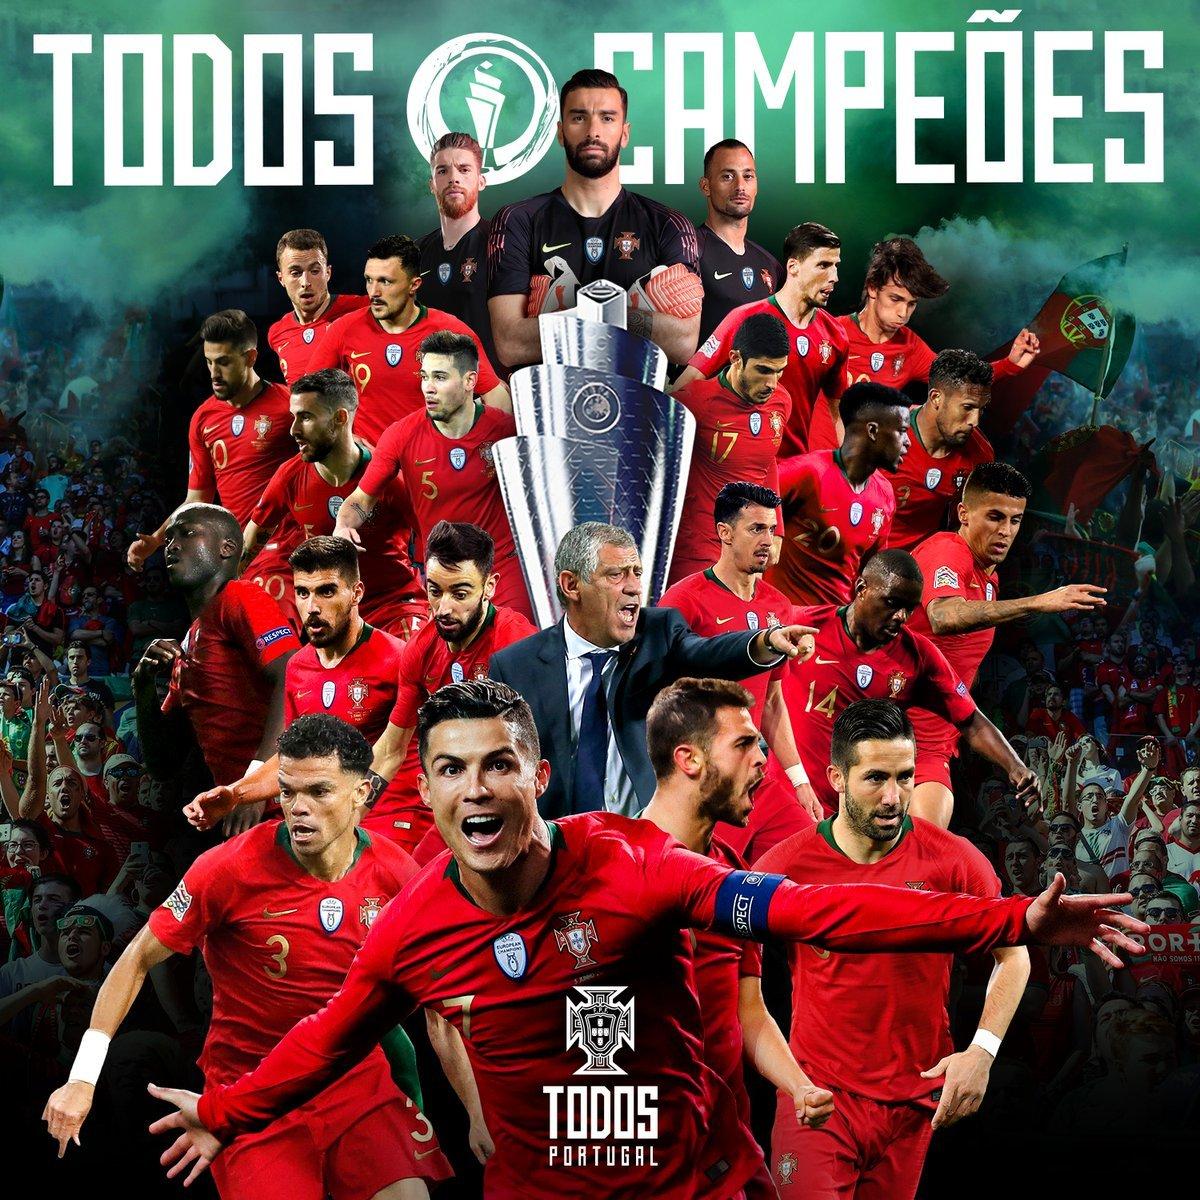 Bồ Đào Nha,Hà Lan,Nations League,Ronaldo,Van Dijk